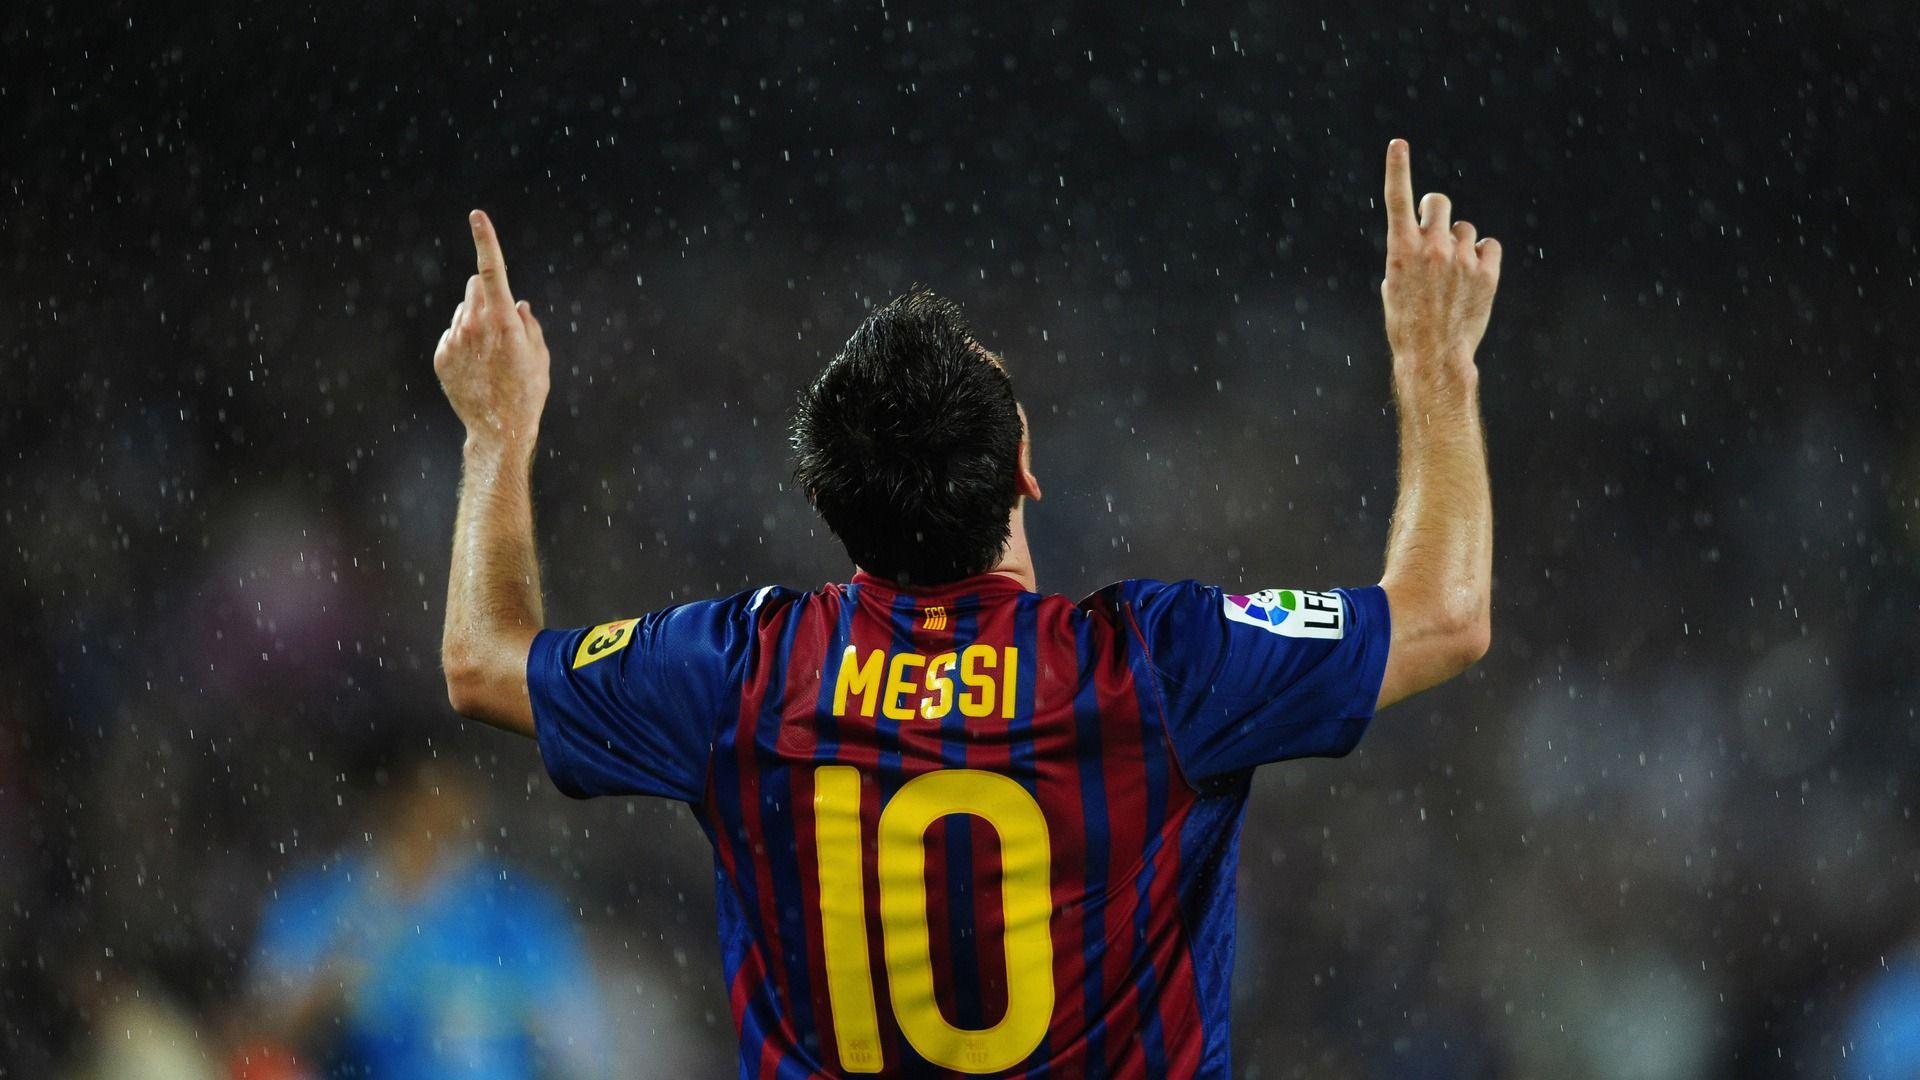 Happy Lionel Messi 1080p Hd Sports Wallpaper Messi Gol Futebol